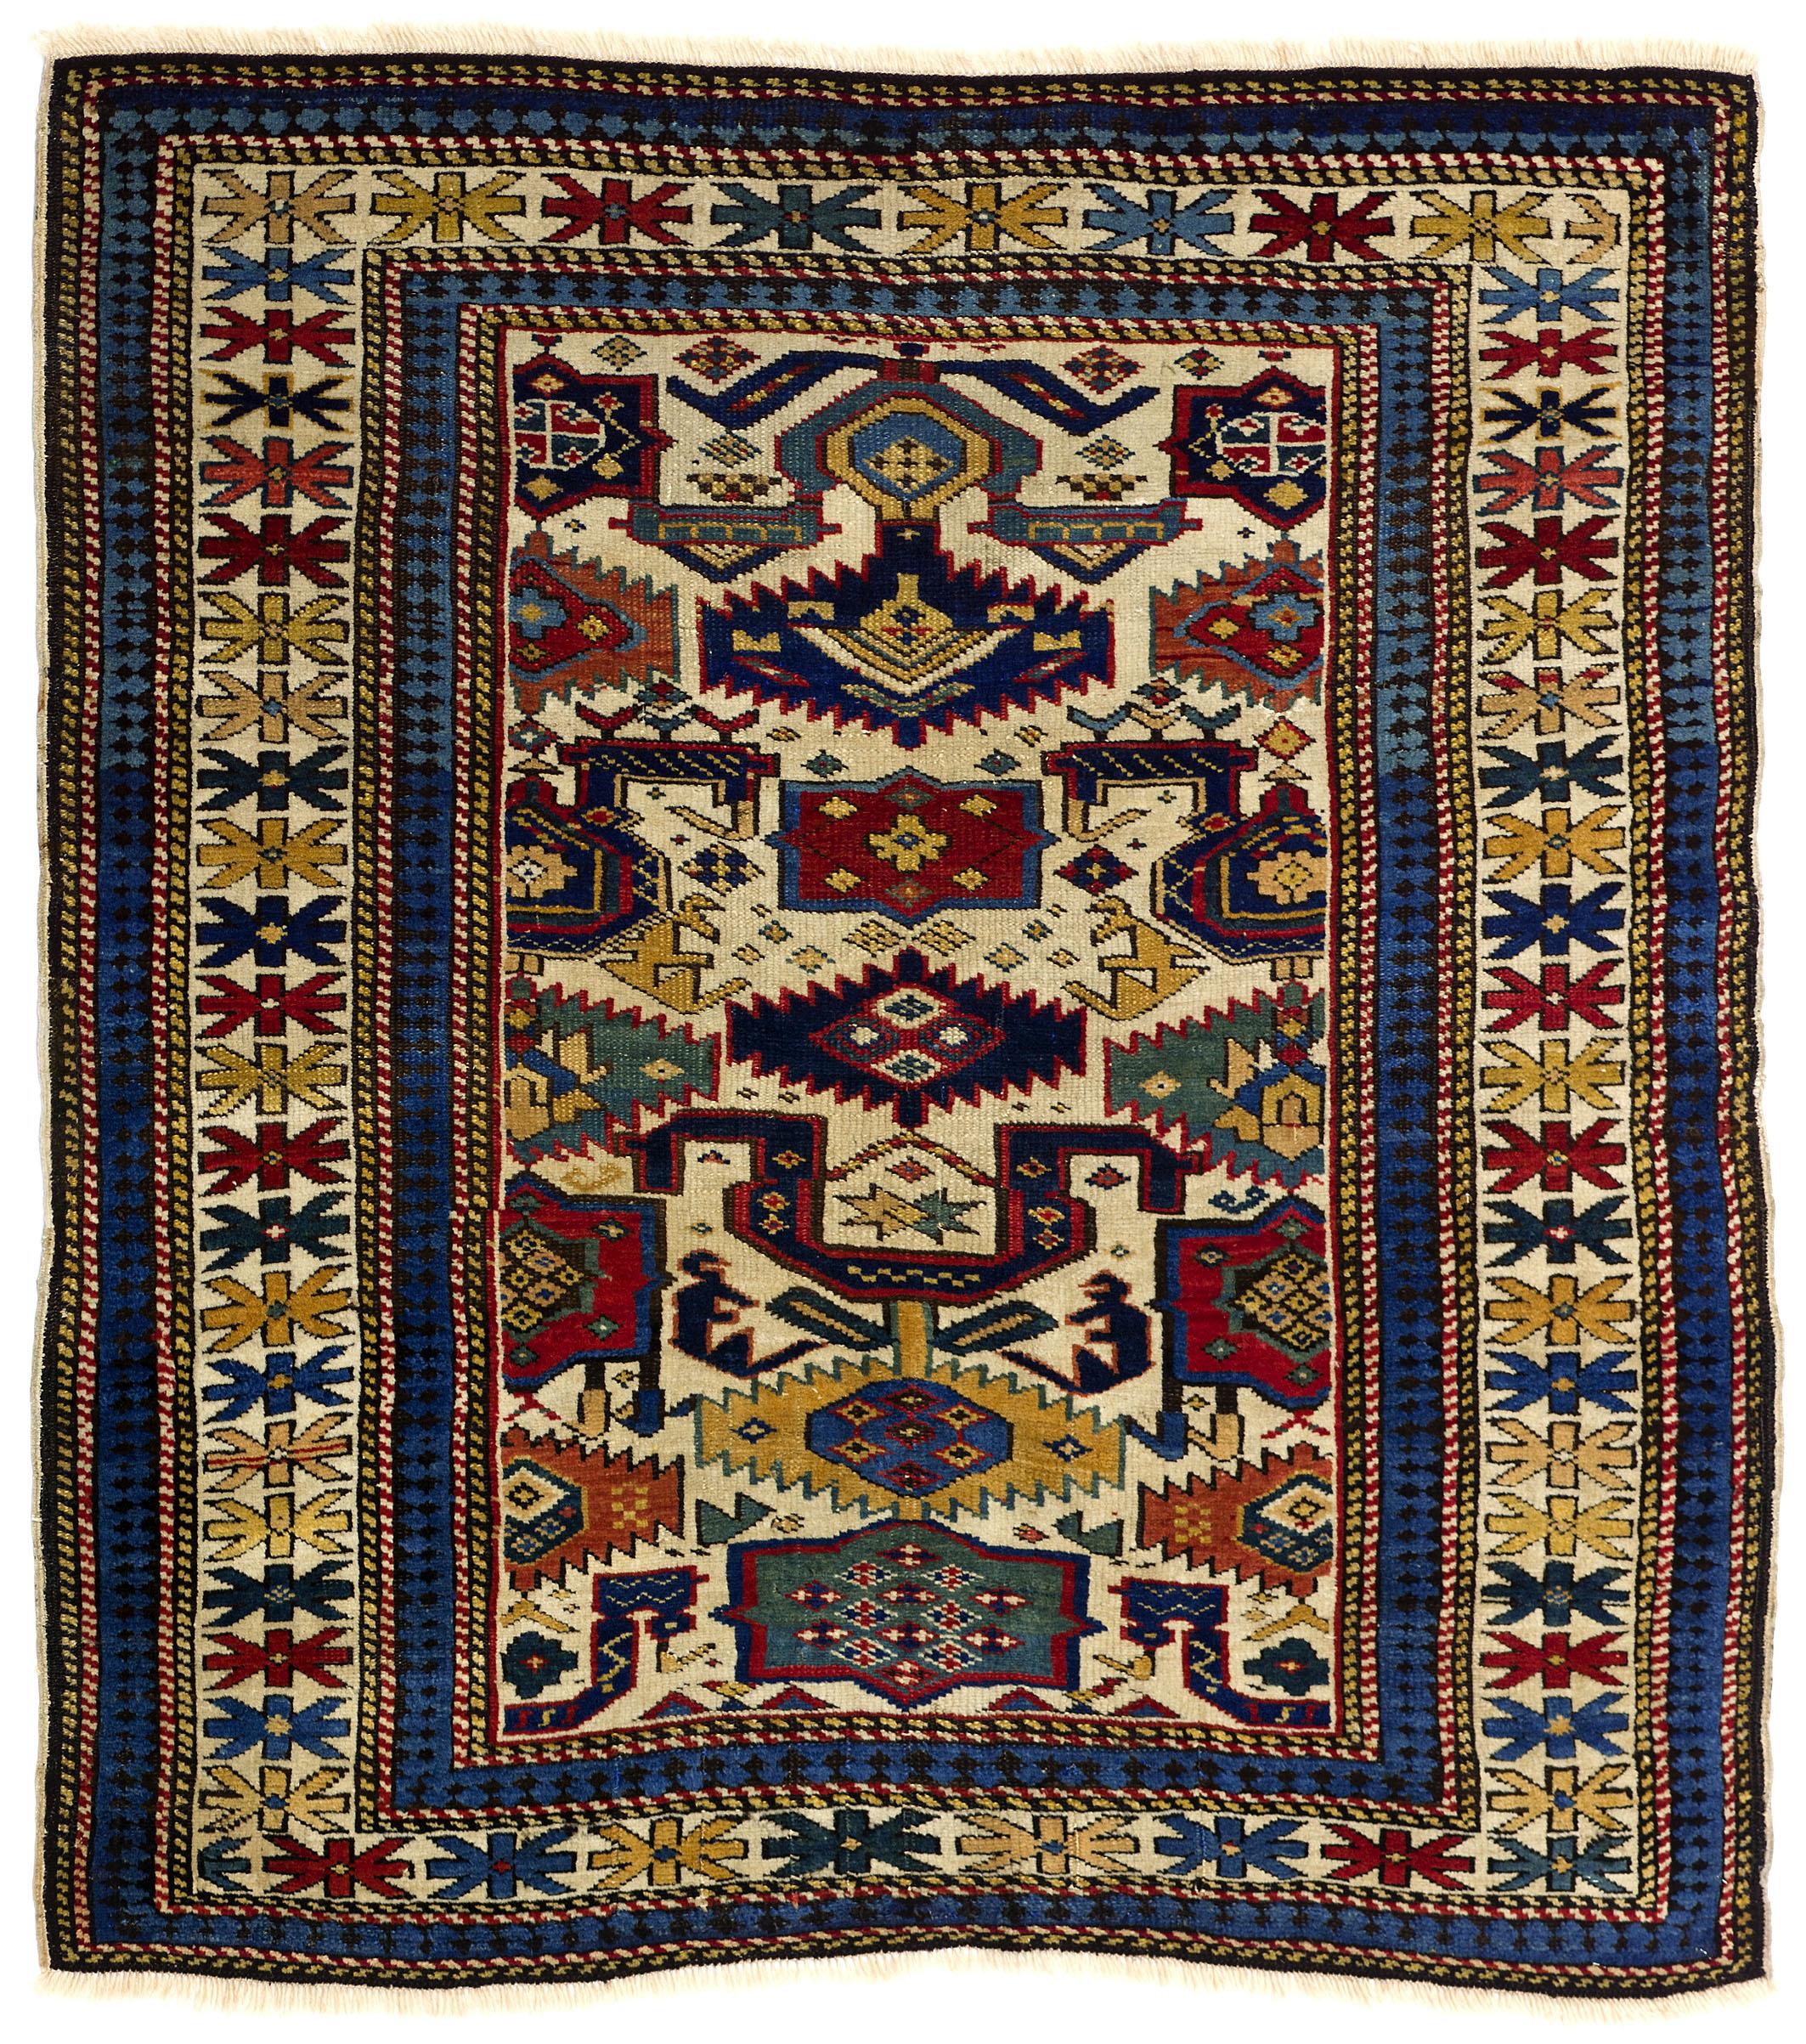 Kuba Or Shirvan Rug Northeast Caucasus 19th Century 110 X 114cm Teppichhaus